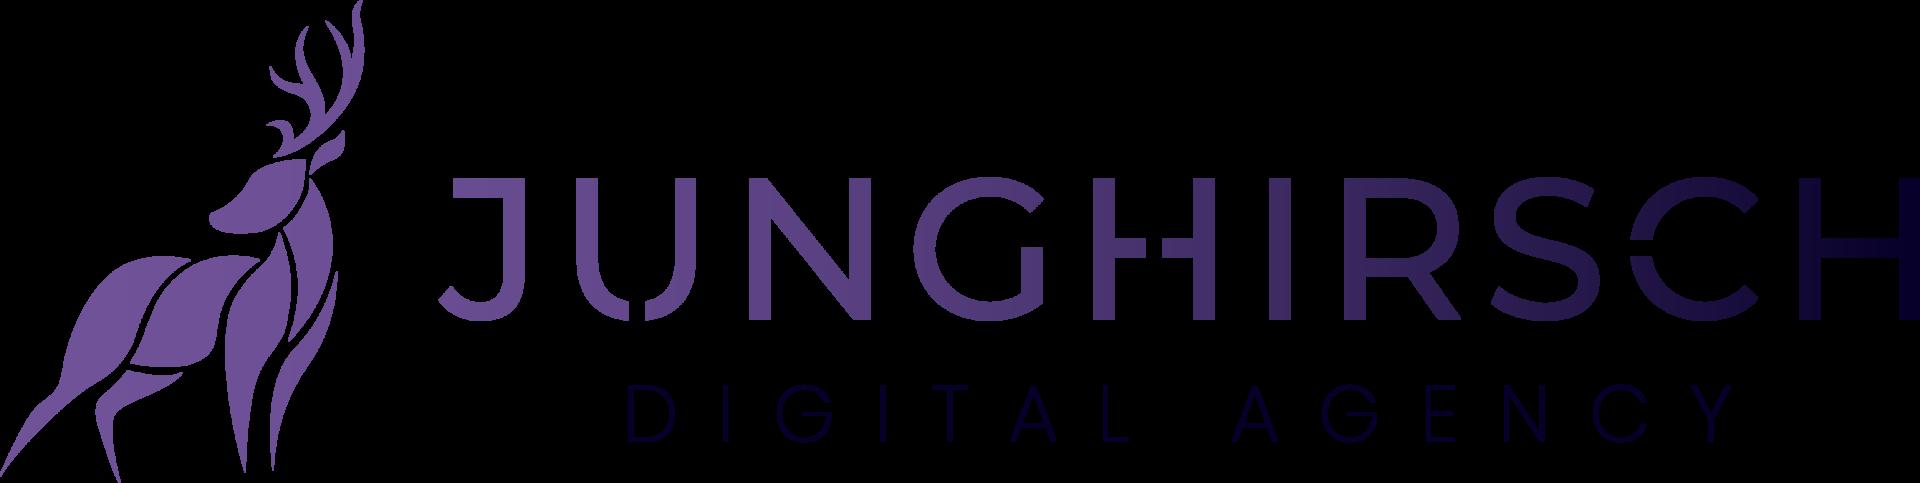 Junghirsch_Gmbh_Logo